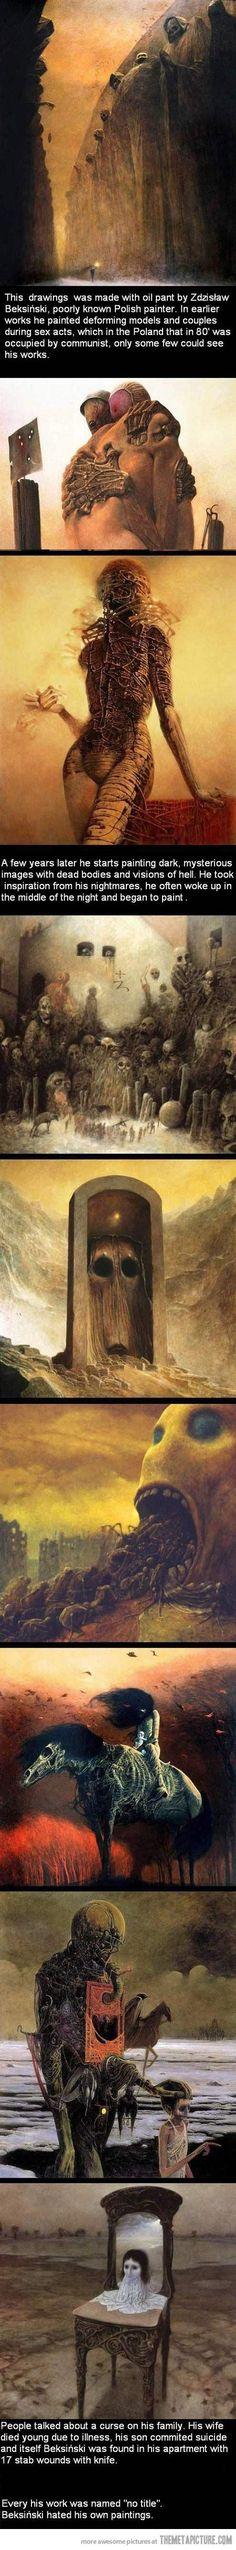 by Bersinski a little known polish artist ... Strangely drawn to these #gothic #horror #darkness: